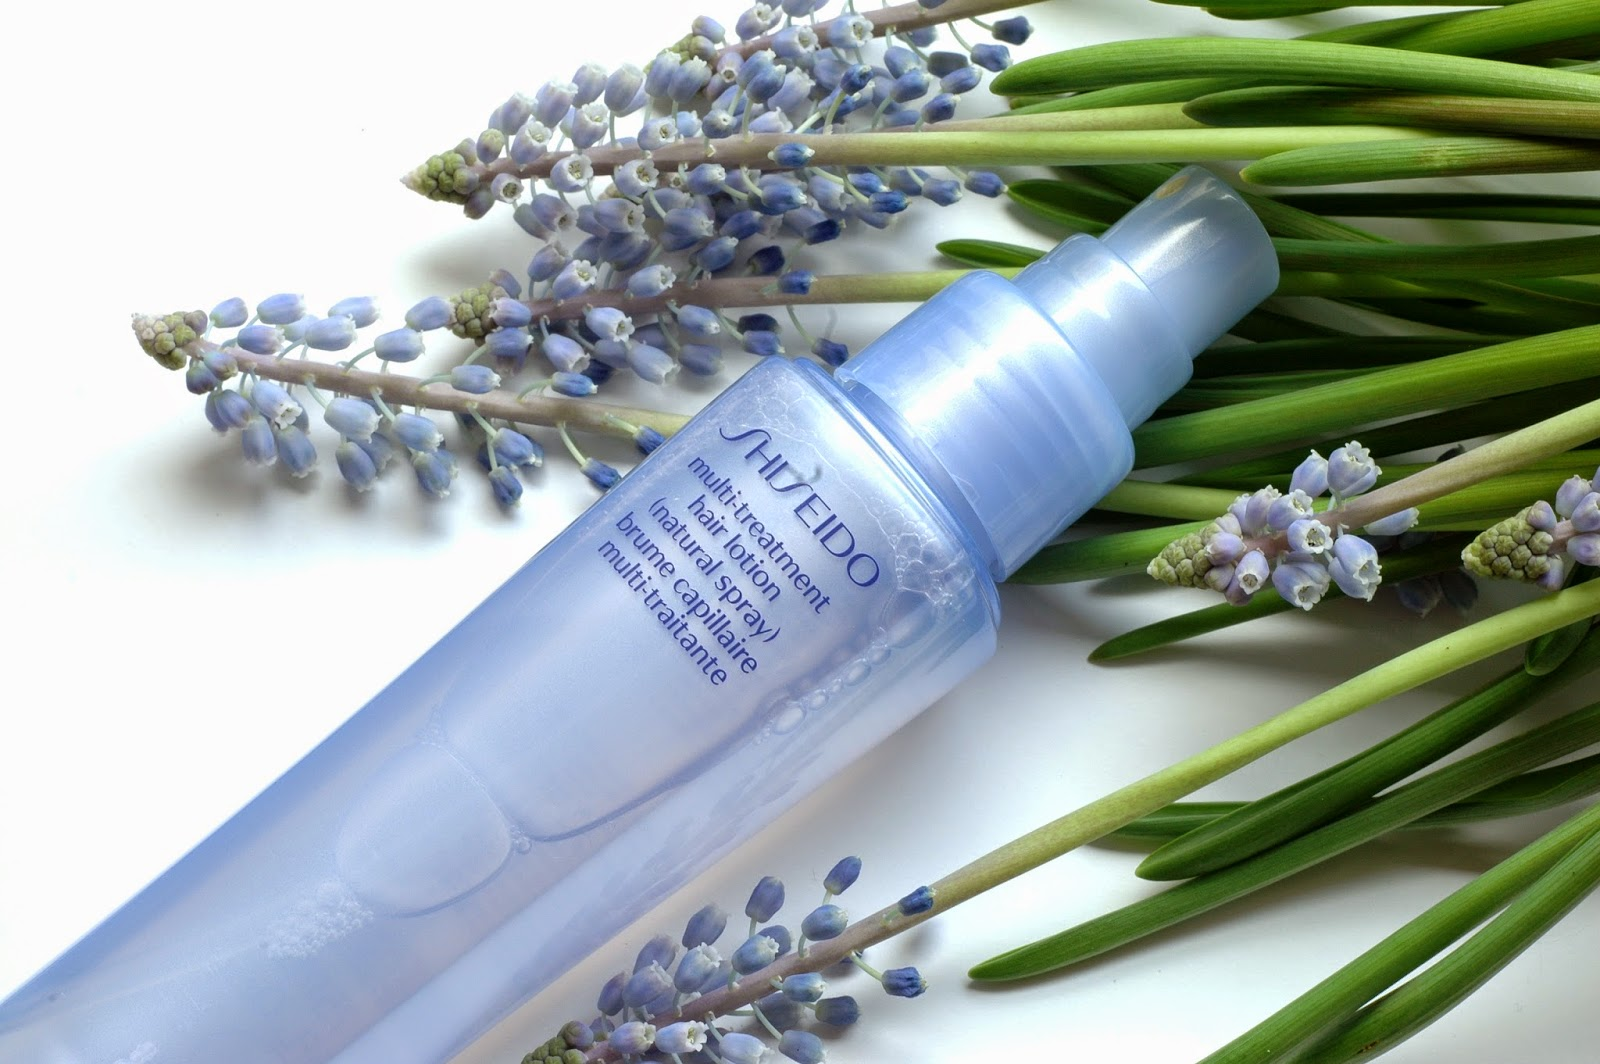 Shiseido Multi Treatment Hair Lotion